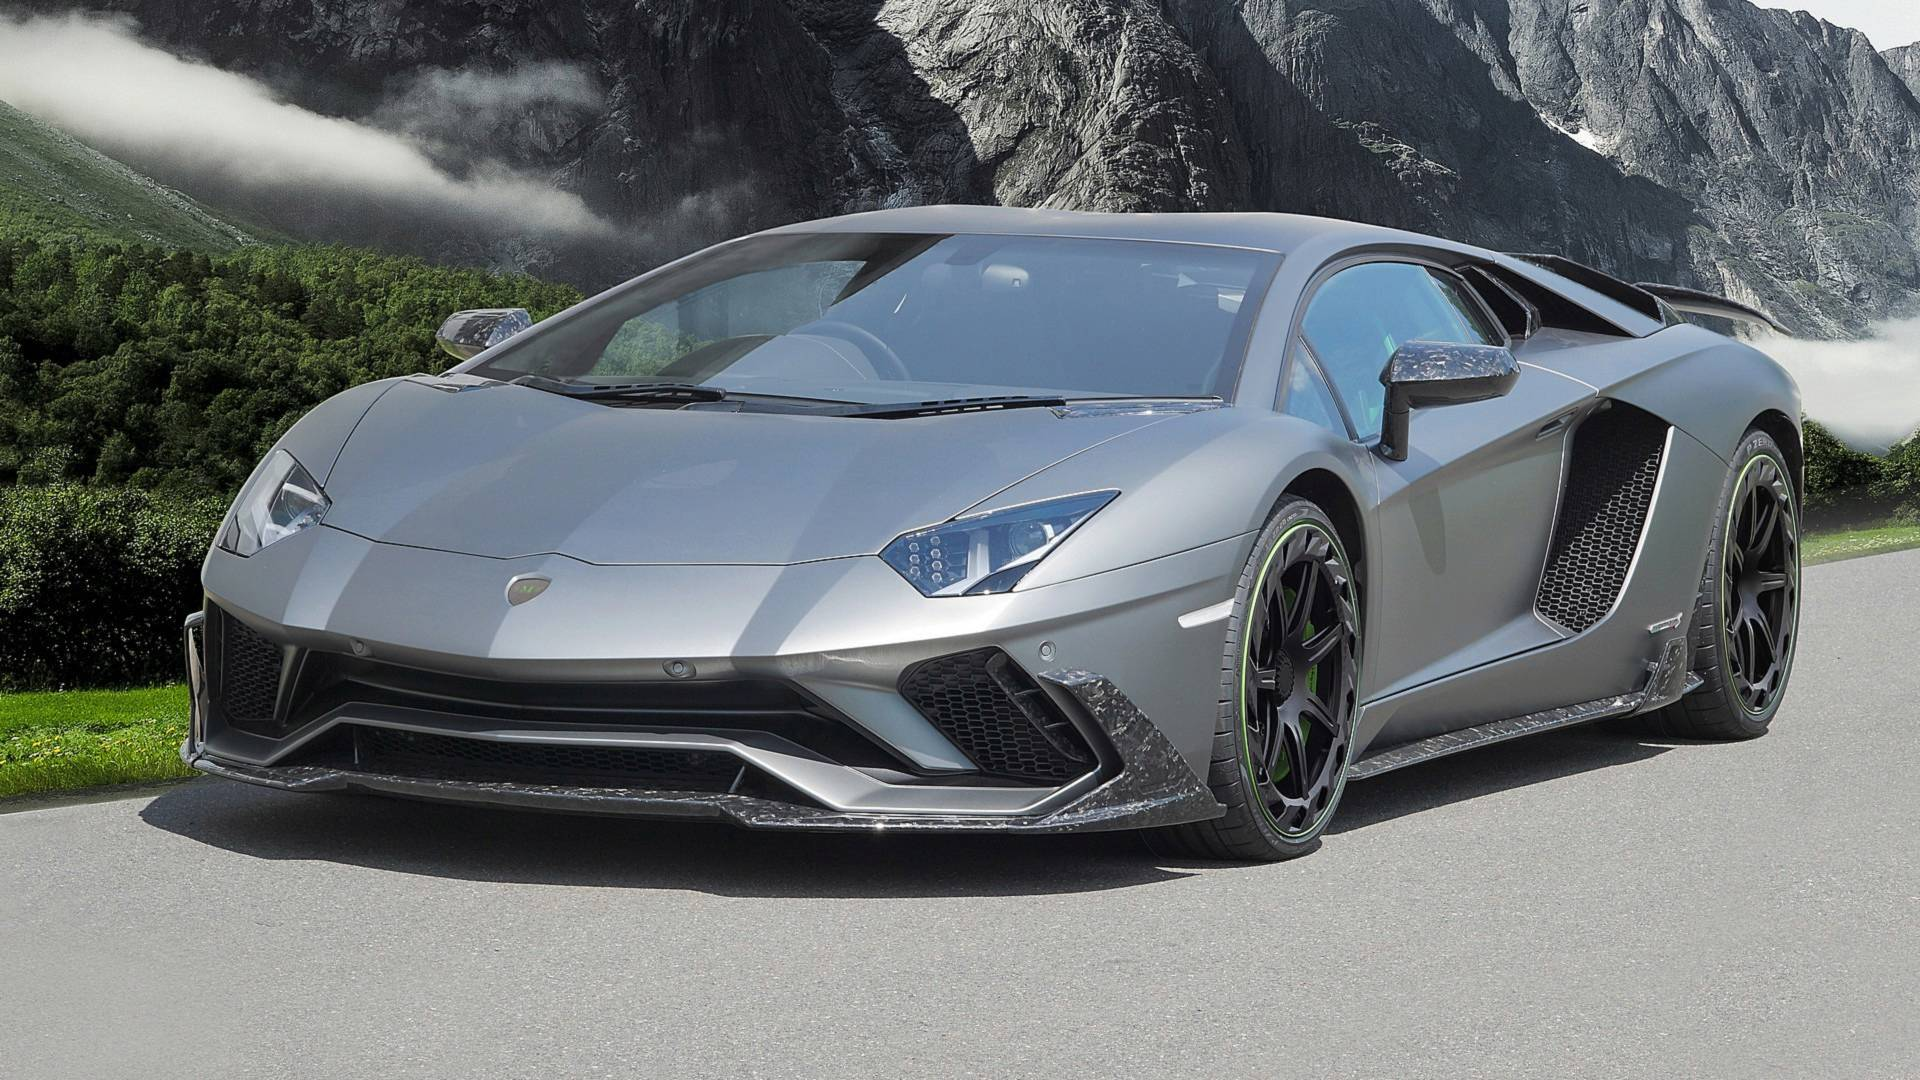 Lamborghini Aventador S by Mansory (2)